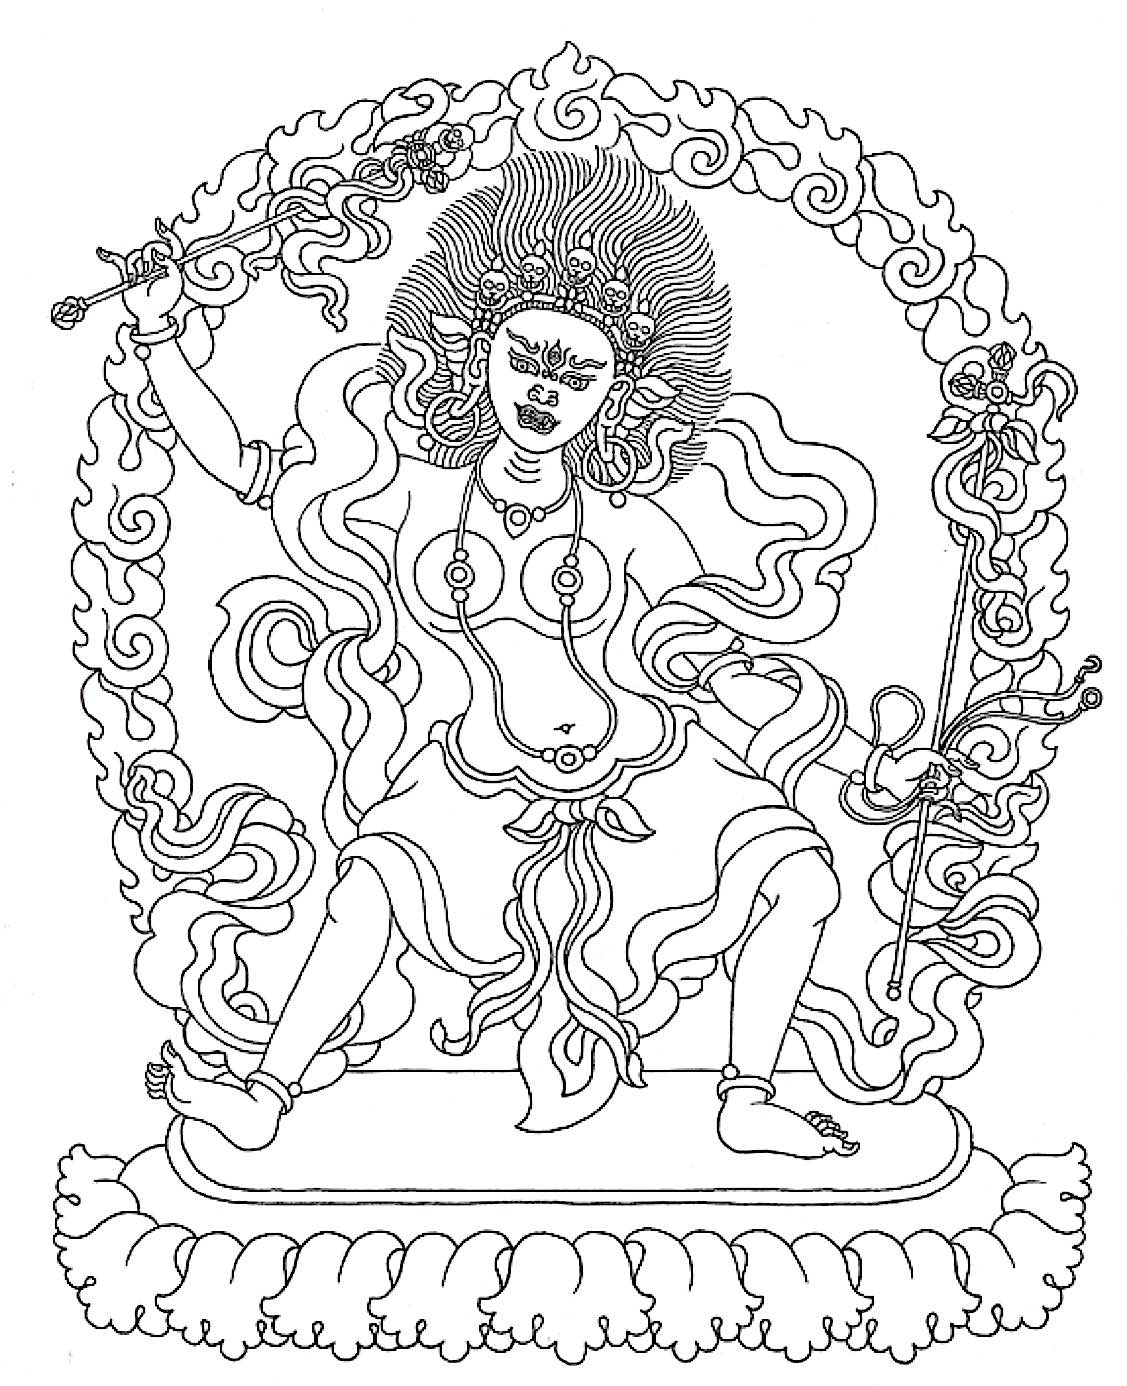 Buddha Weekly Tara 11 Tara Who summons all beings and dispels misfortune Buddhism